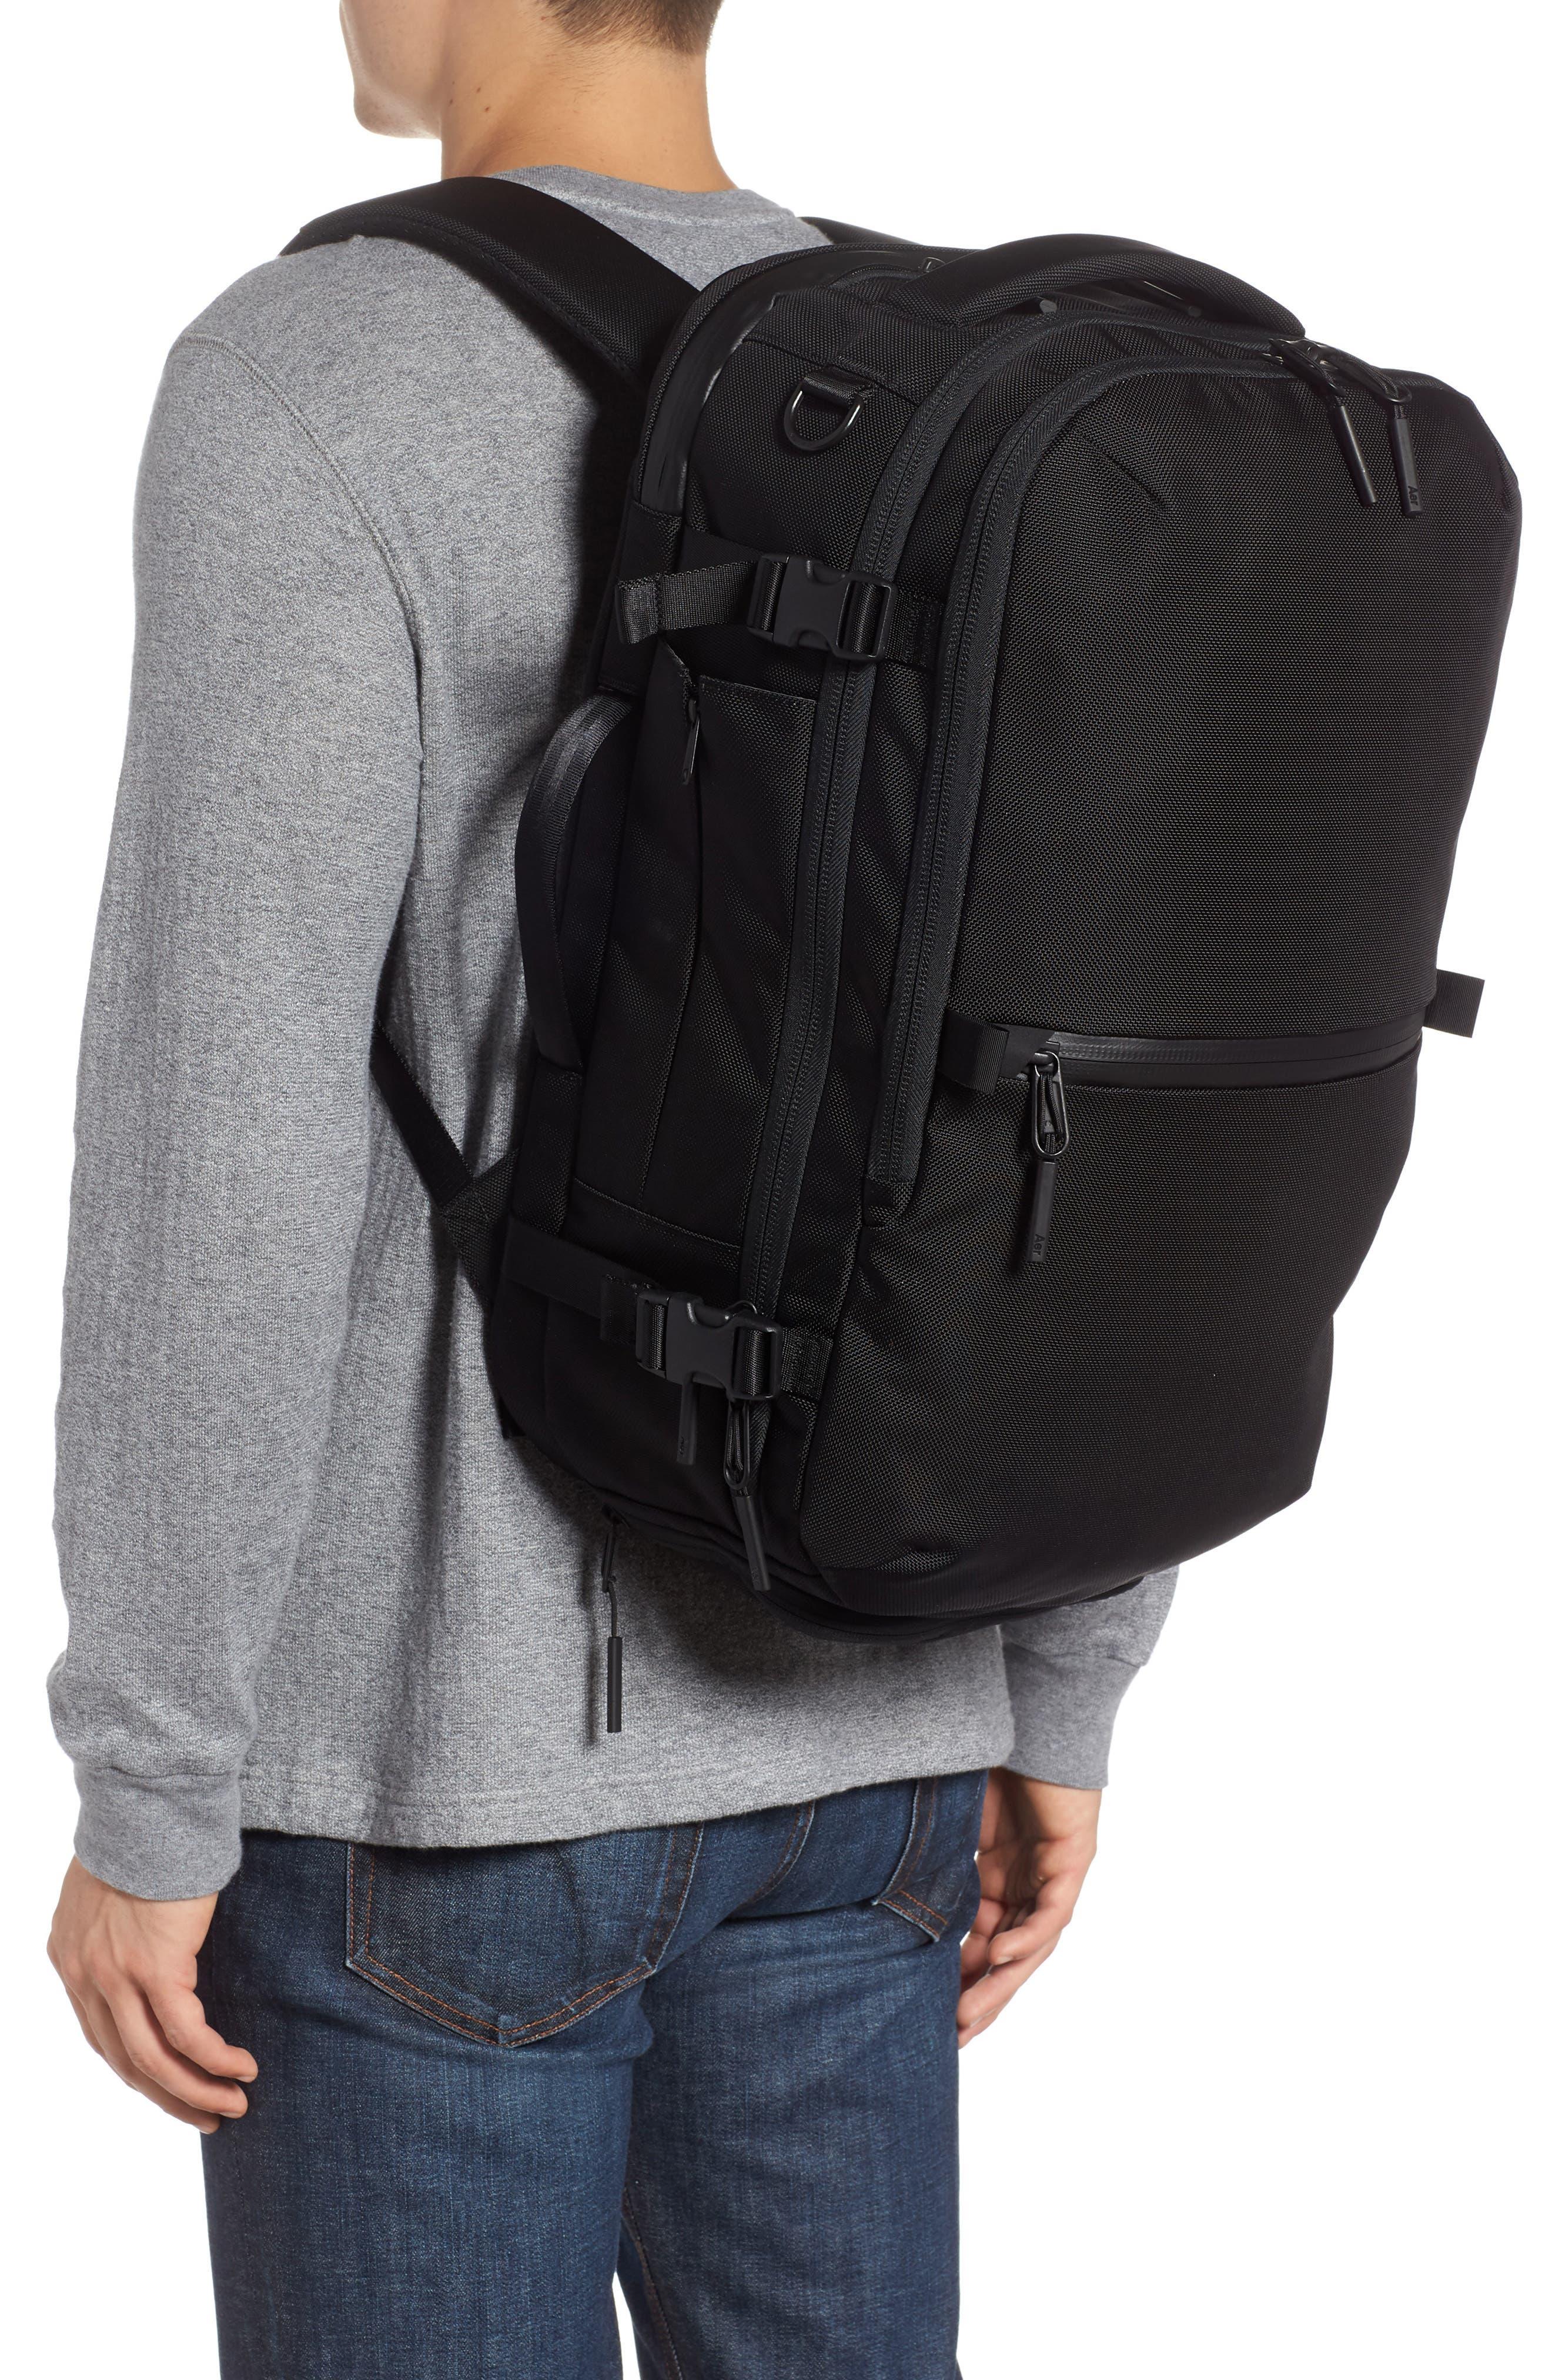 Travel Pack 2 Backpack,                             Alternate thumbnail 2, color,                             BLACK